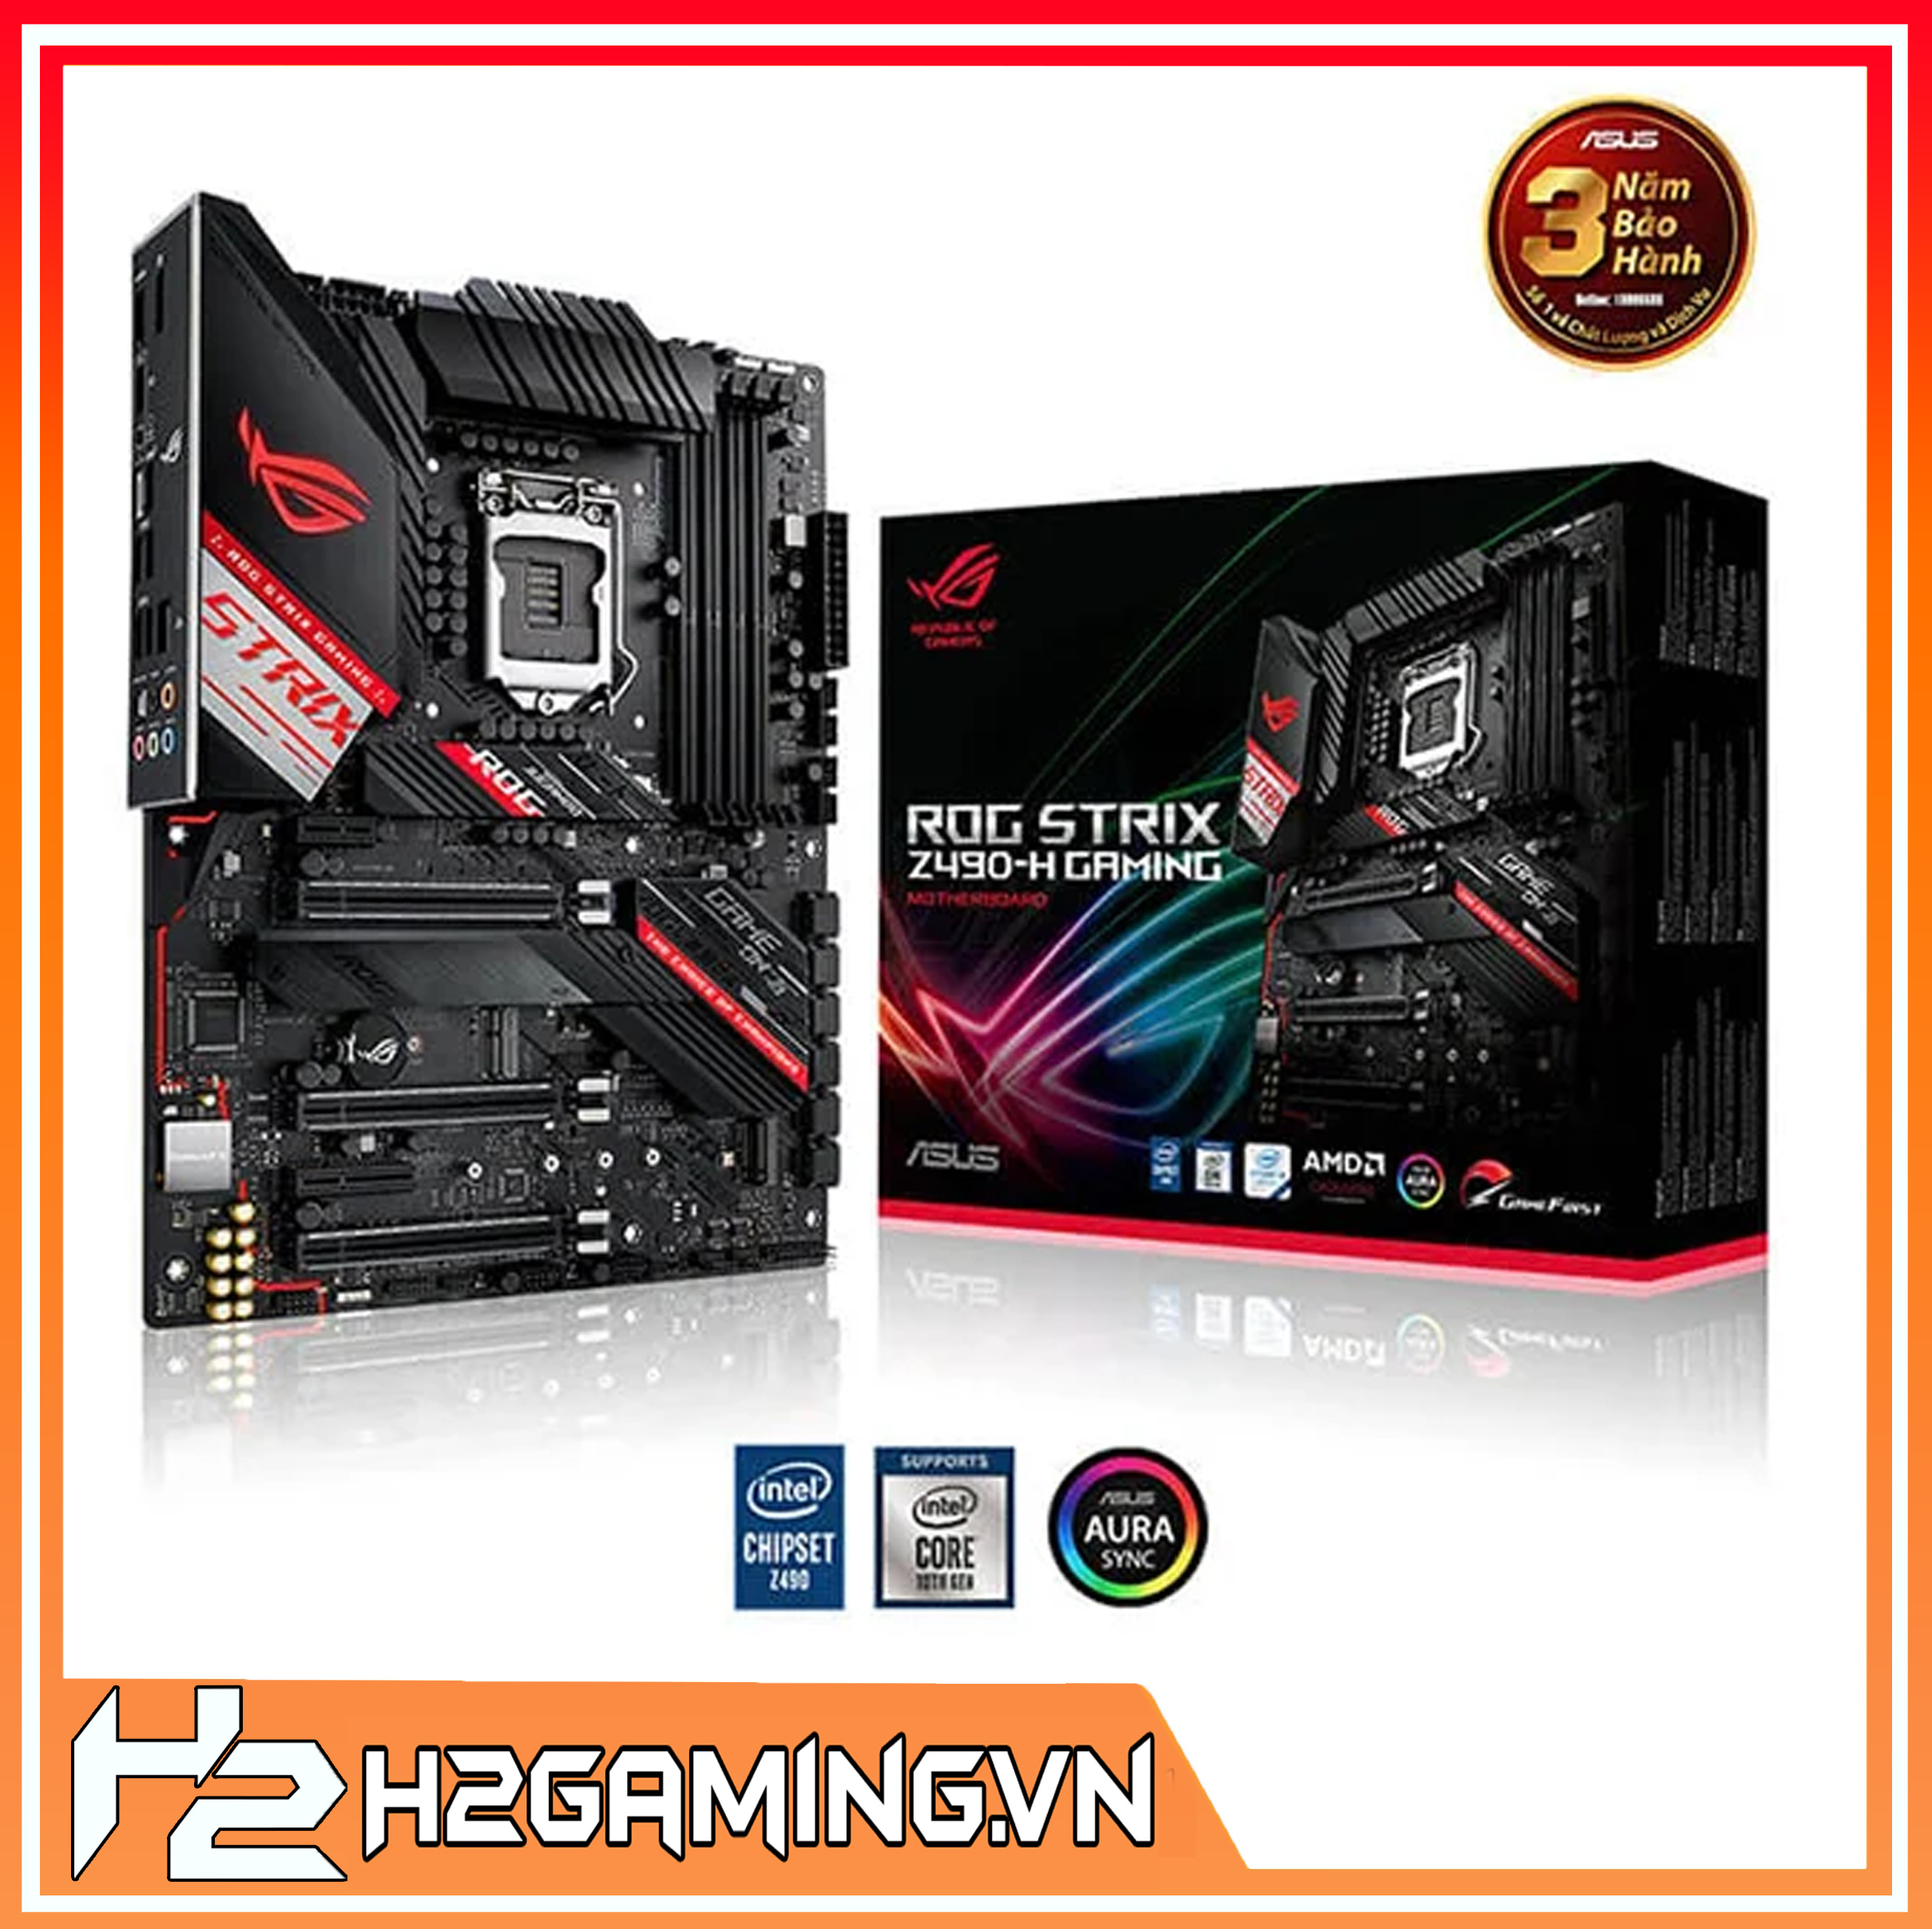 rog_strix_z490-h_gaming_3